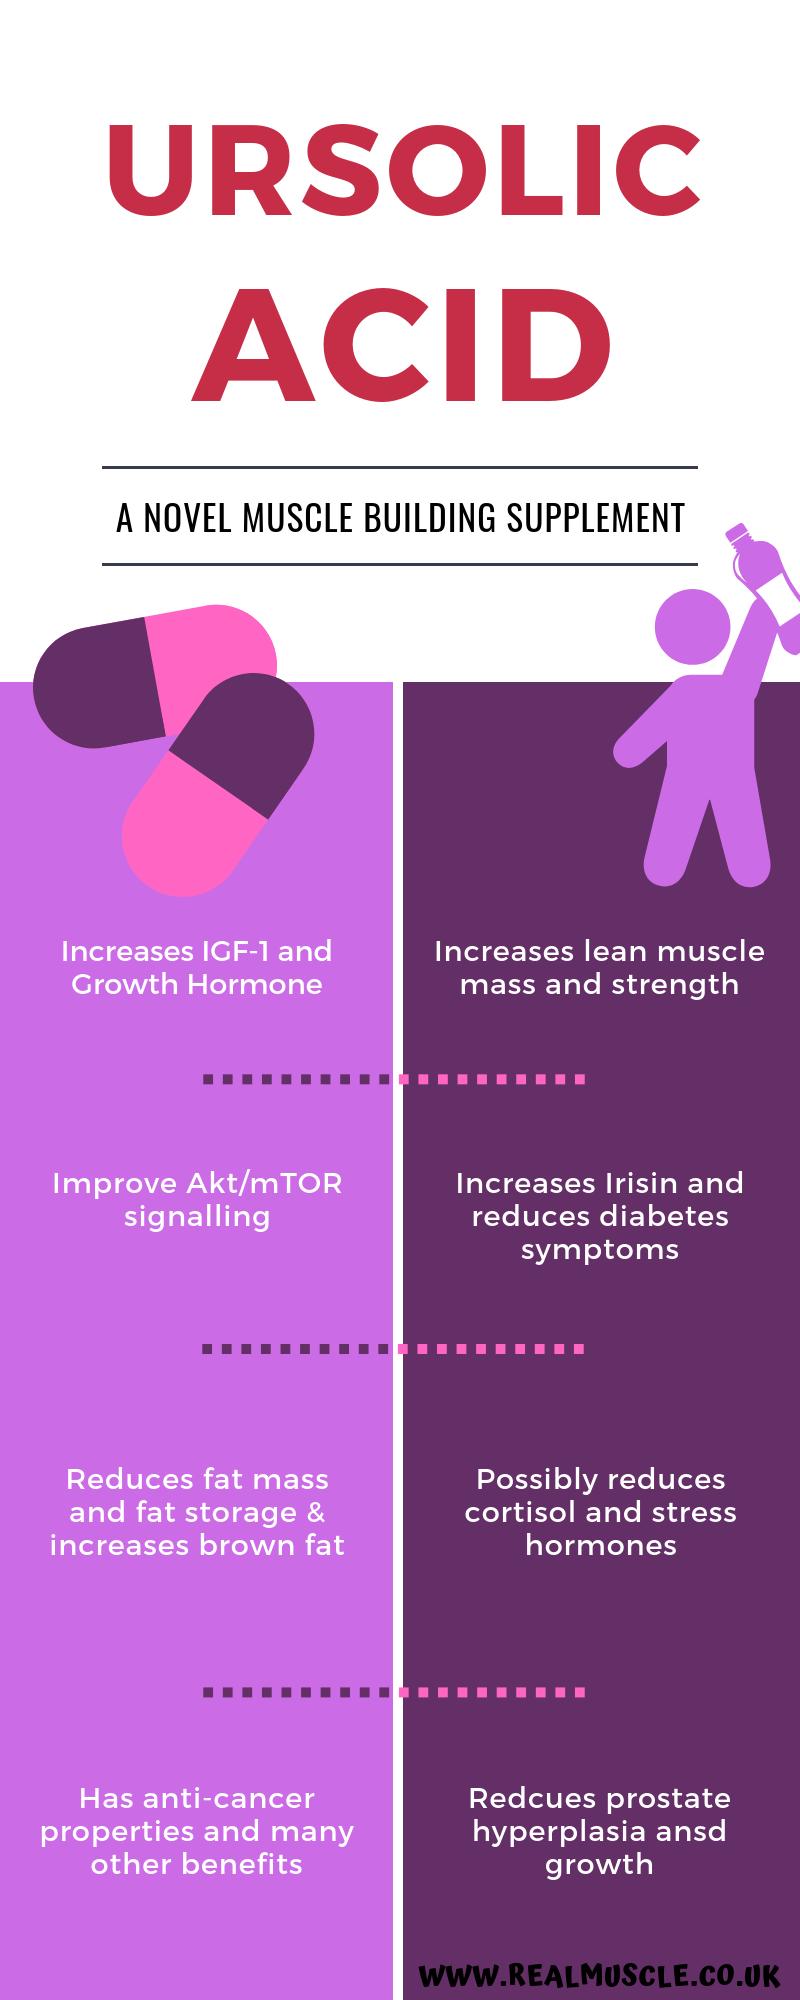 Ursolic Acid Infographic